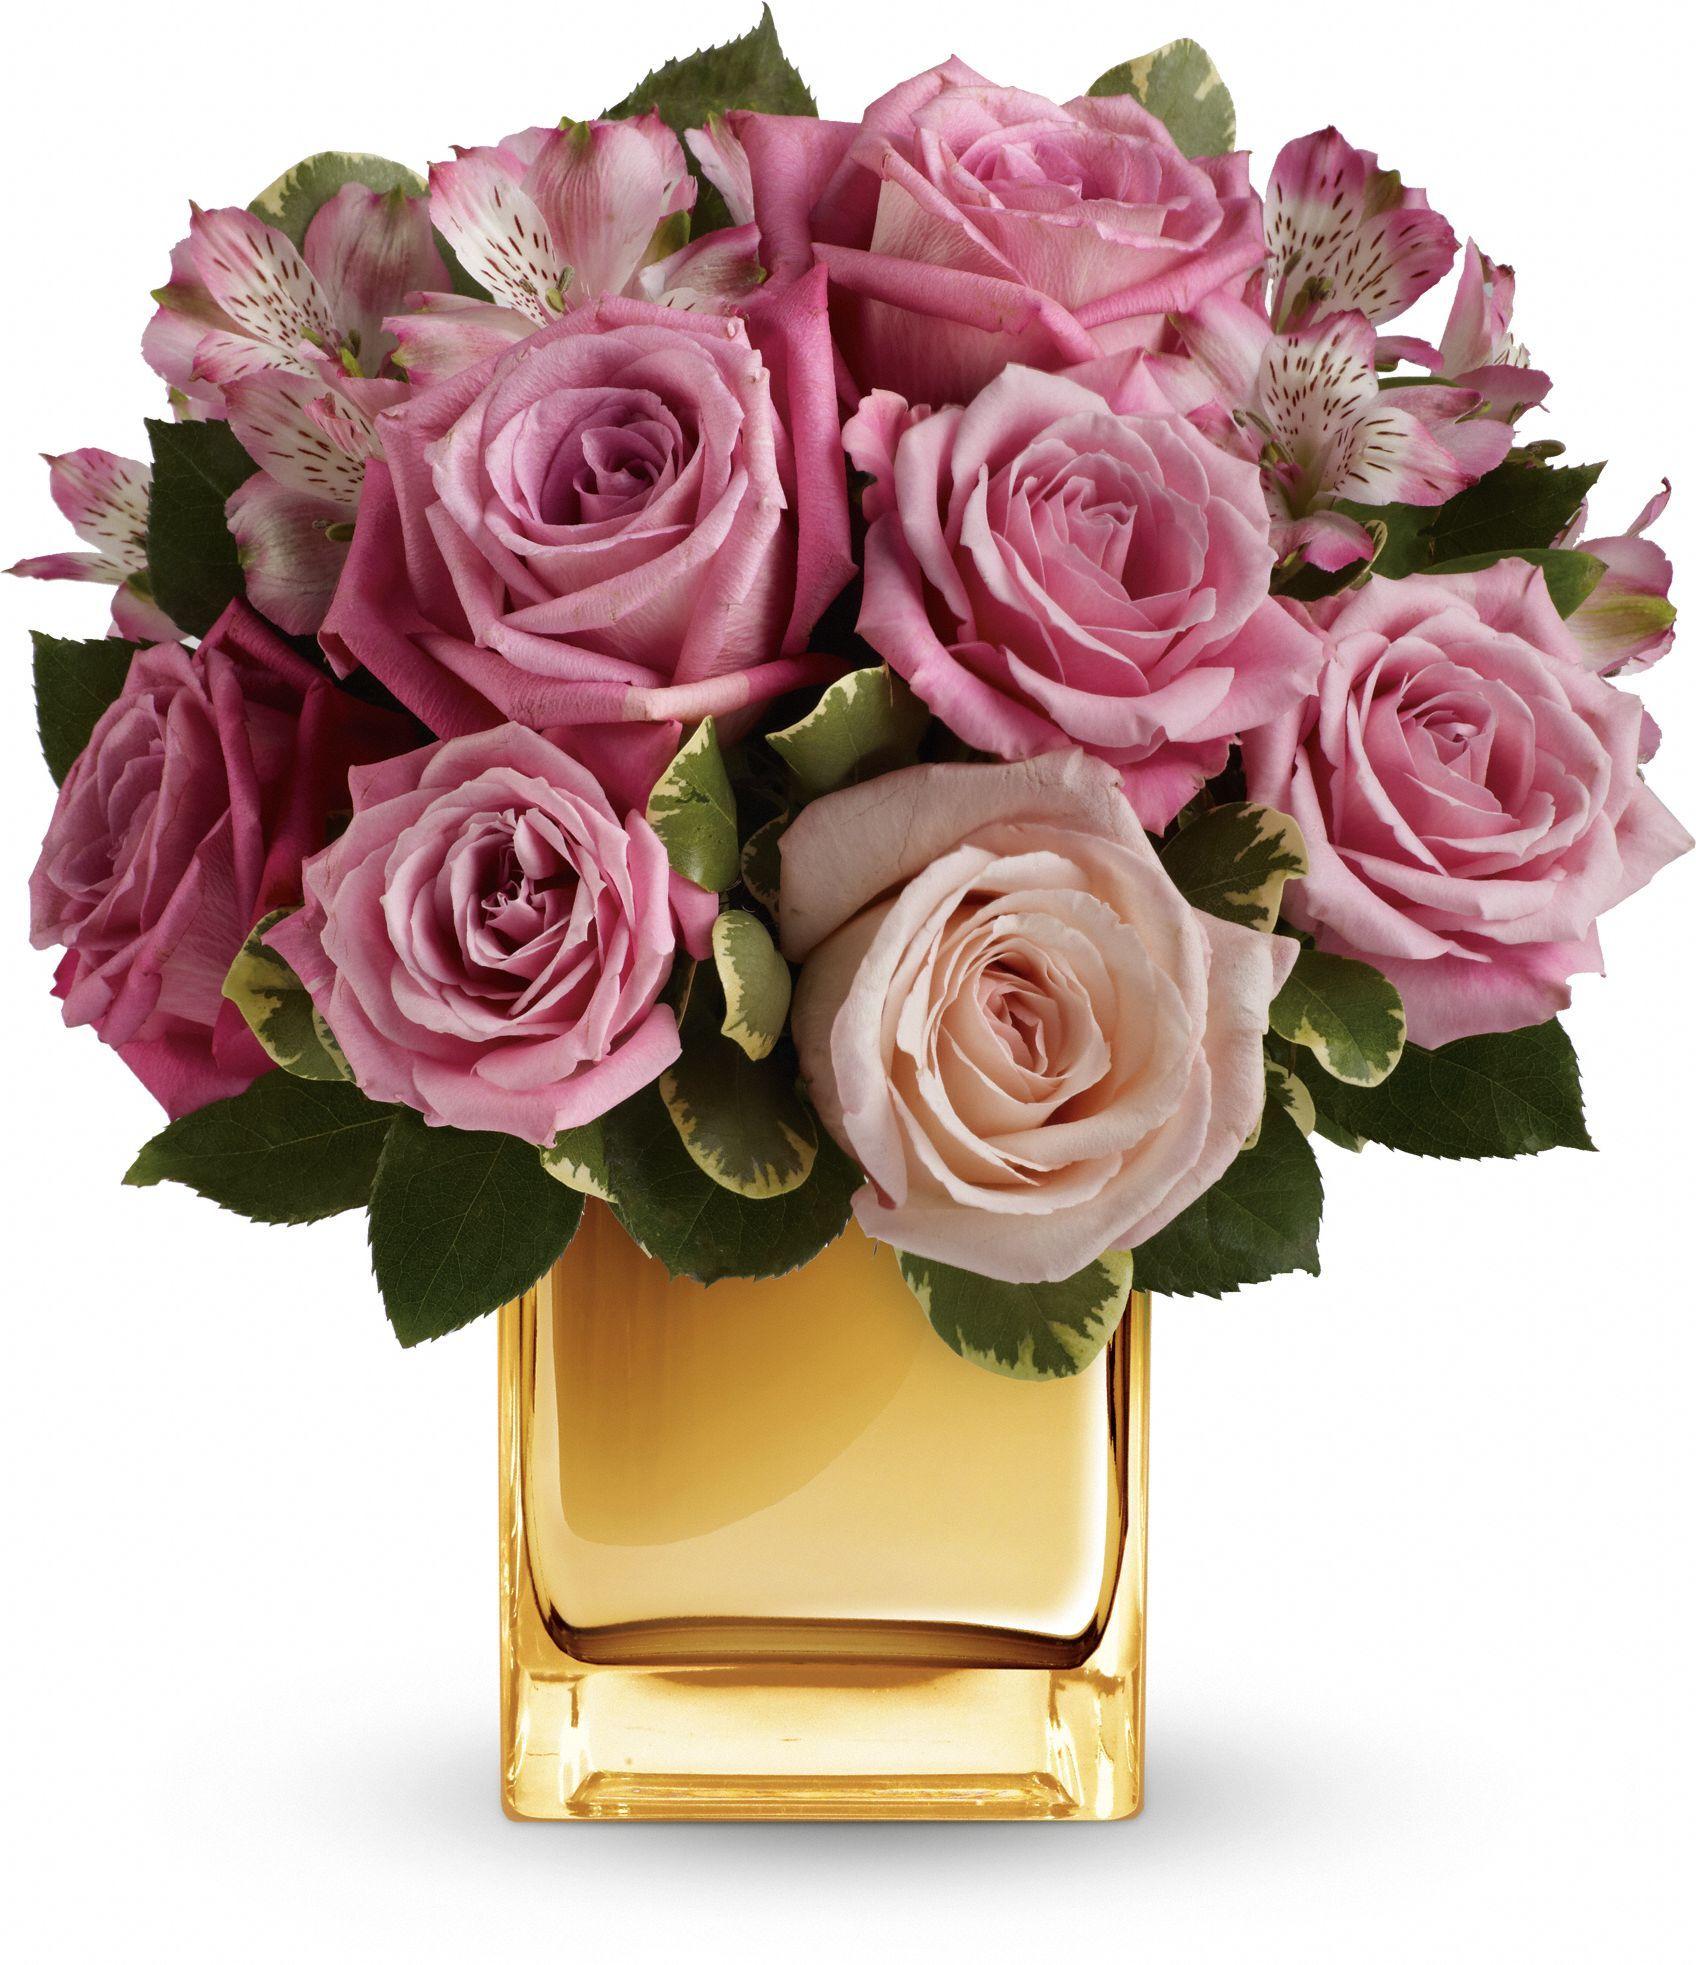 A Radiant Romance flowers by Teleflora